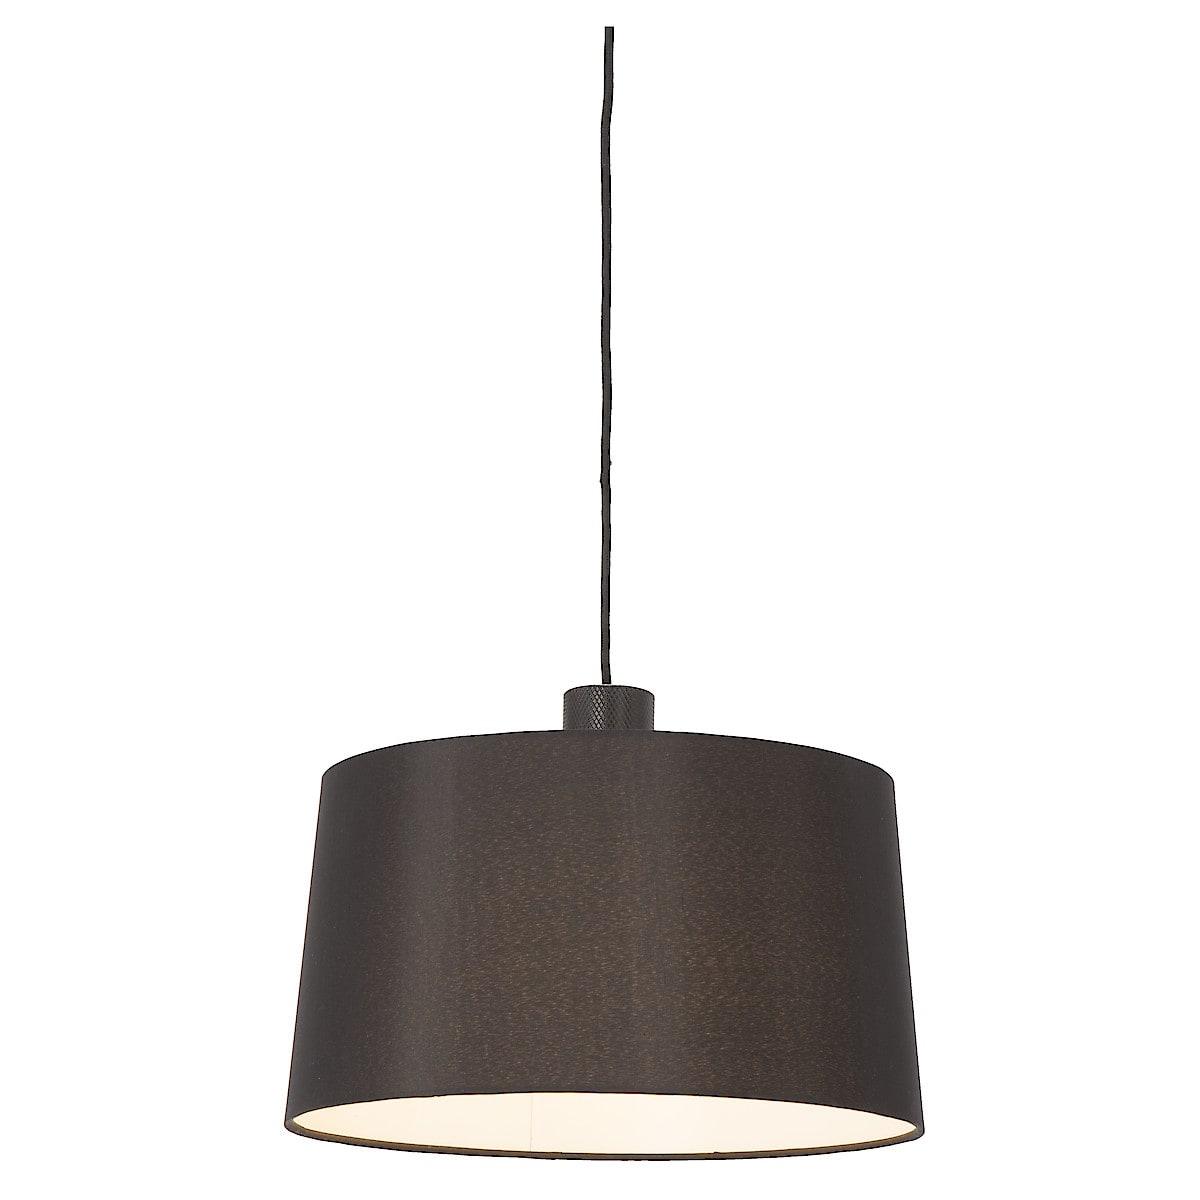 Lampskärm Ø 27 cm Northlight